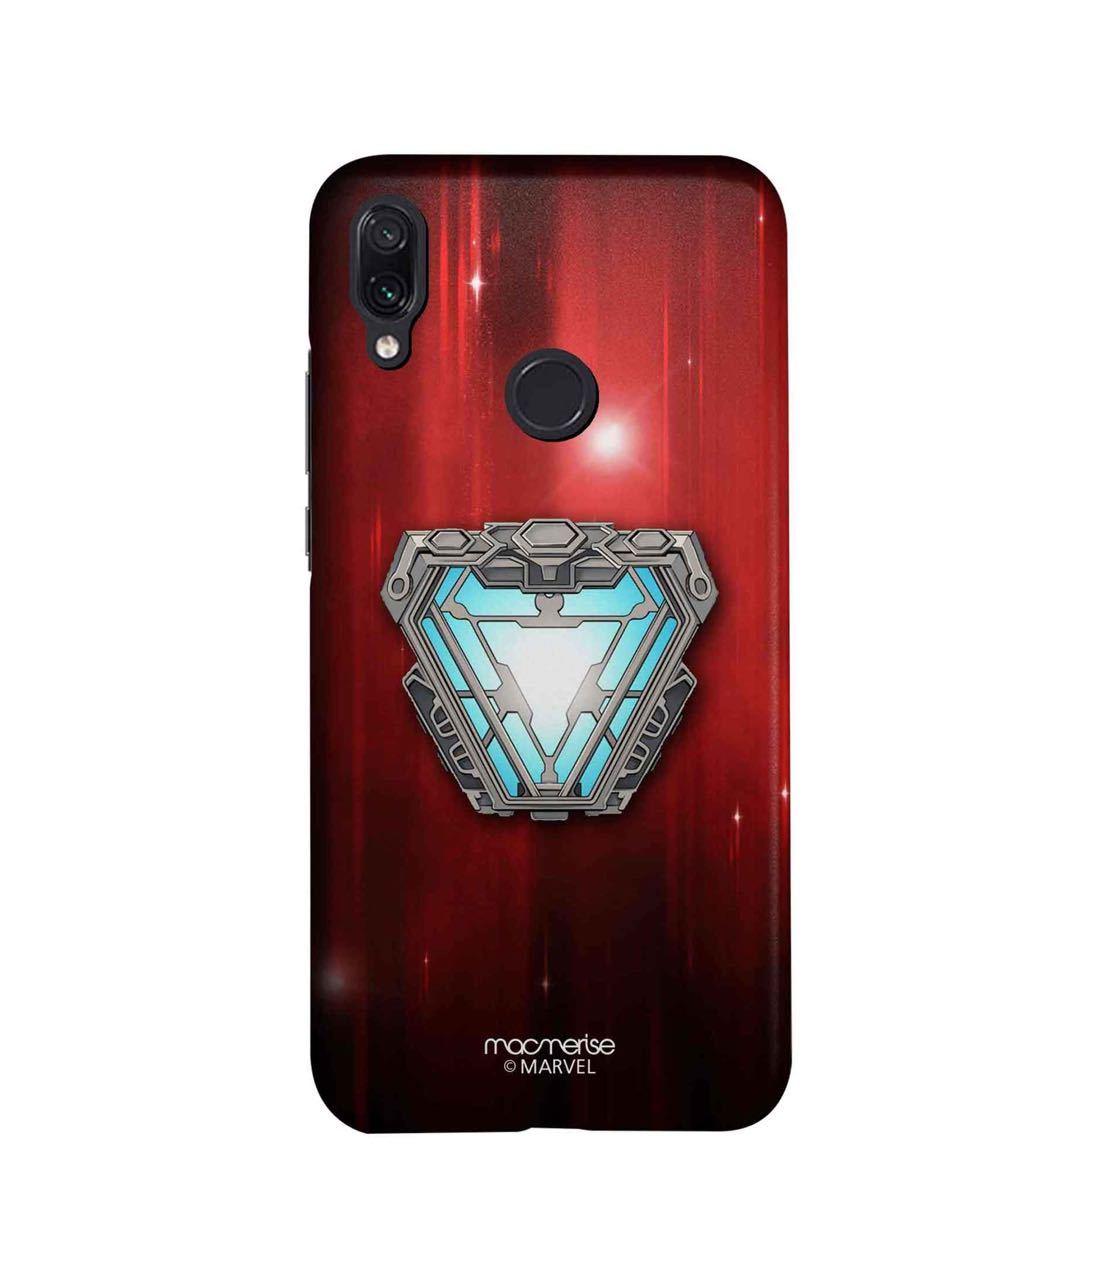 Iron man Infinity Arc Reactor - Sleek Phone Case for Xiaomi Redmi Note 7